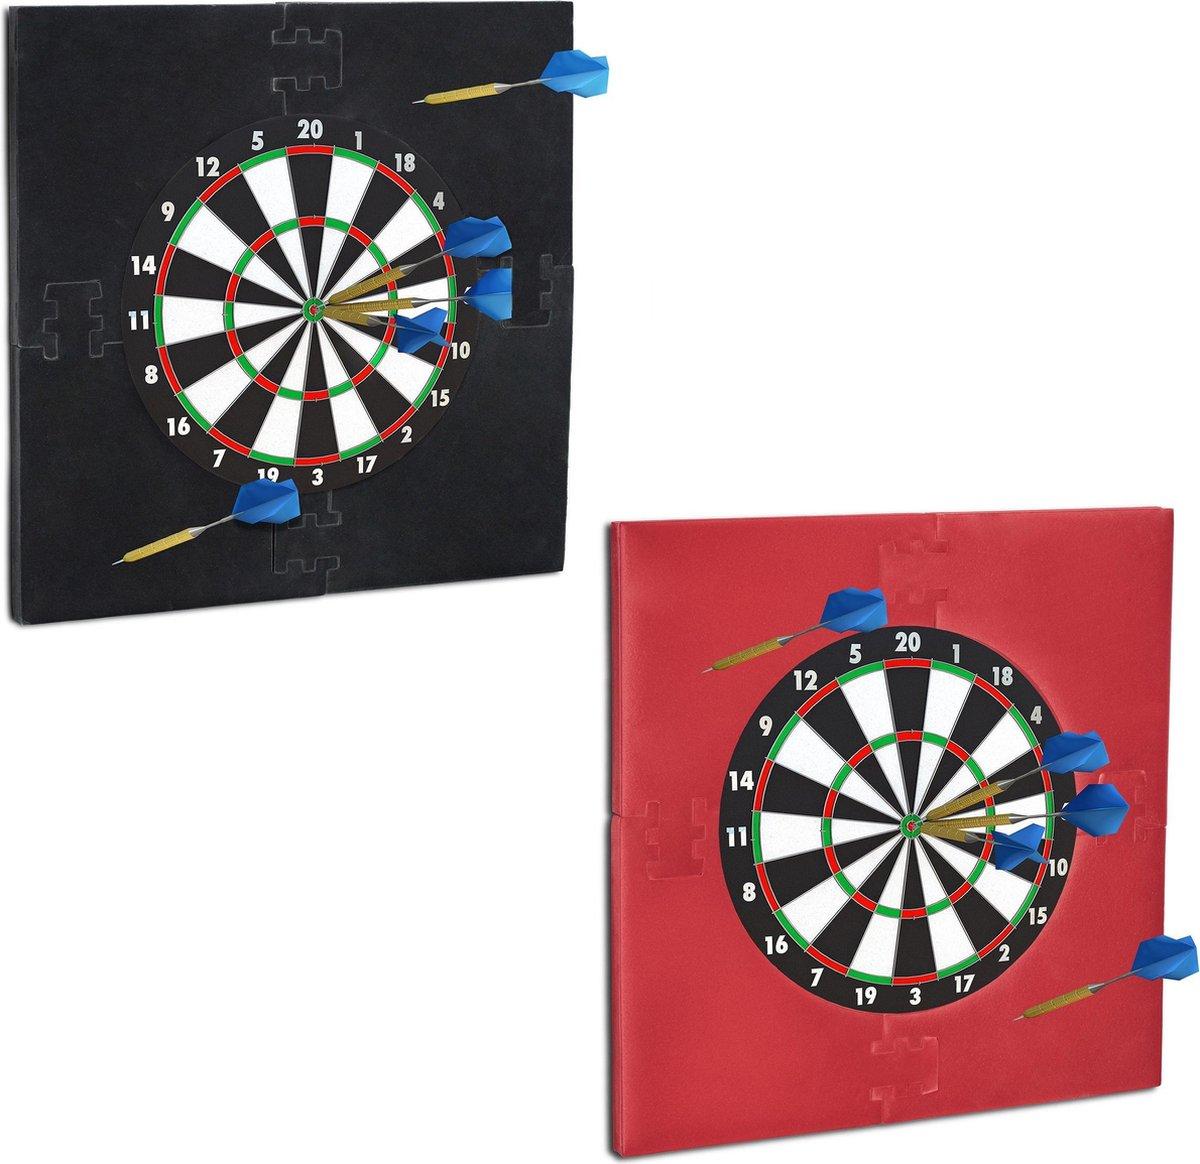 relaxdays dartbord surround ring - beschermrand - beschermring - ring voor dartbord - 45cm grijs